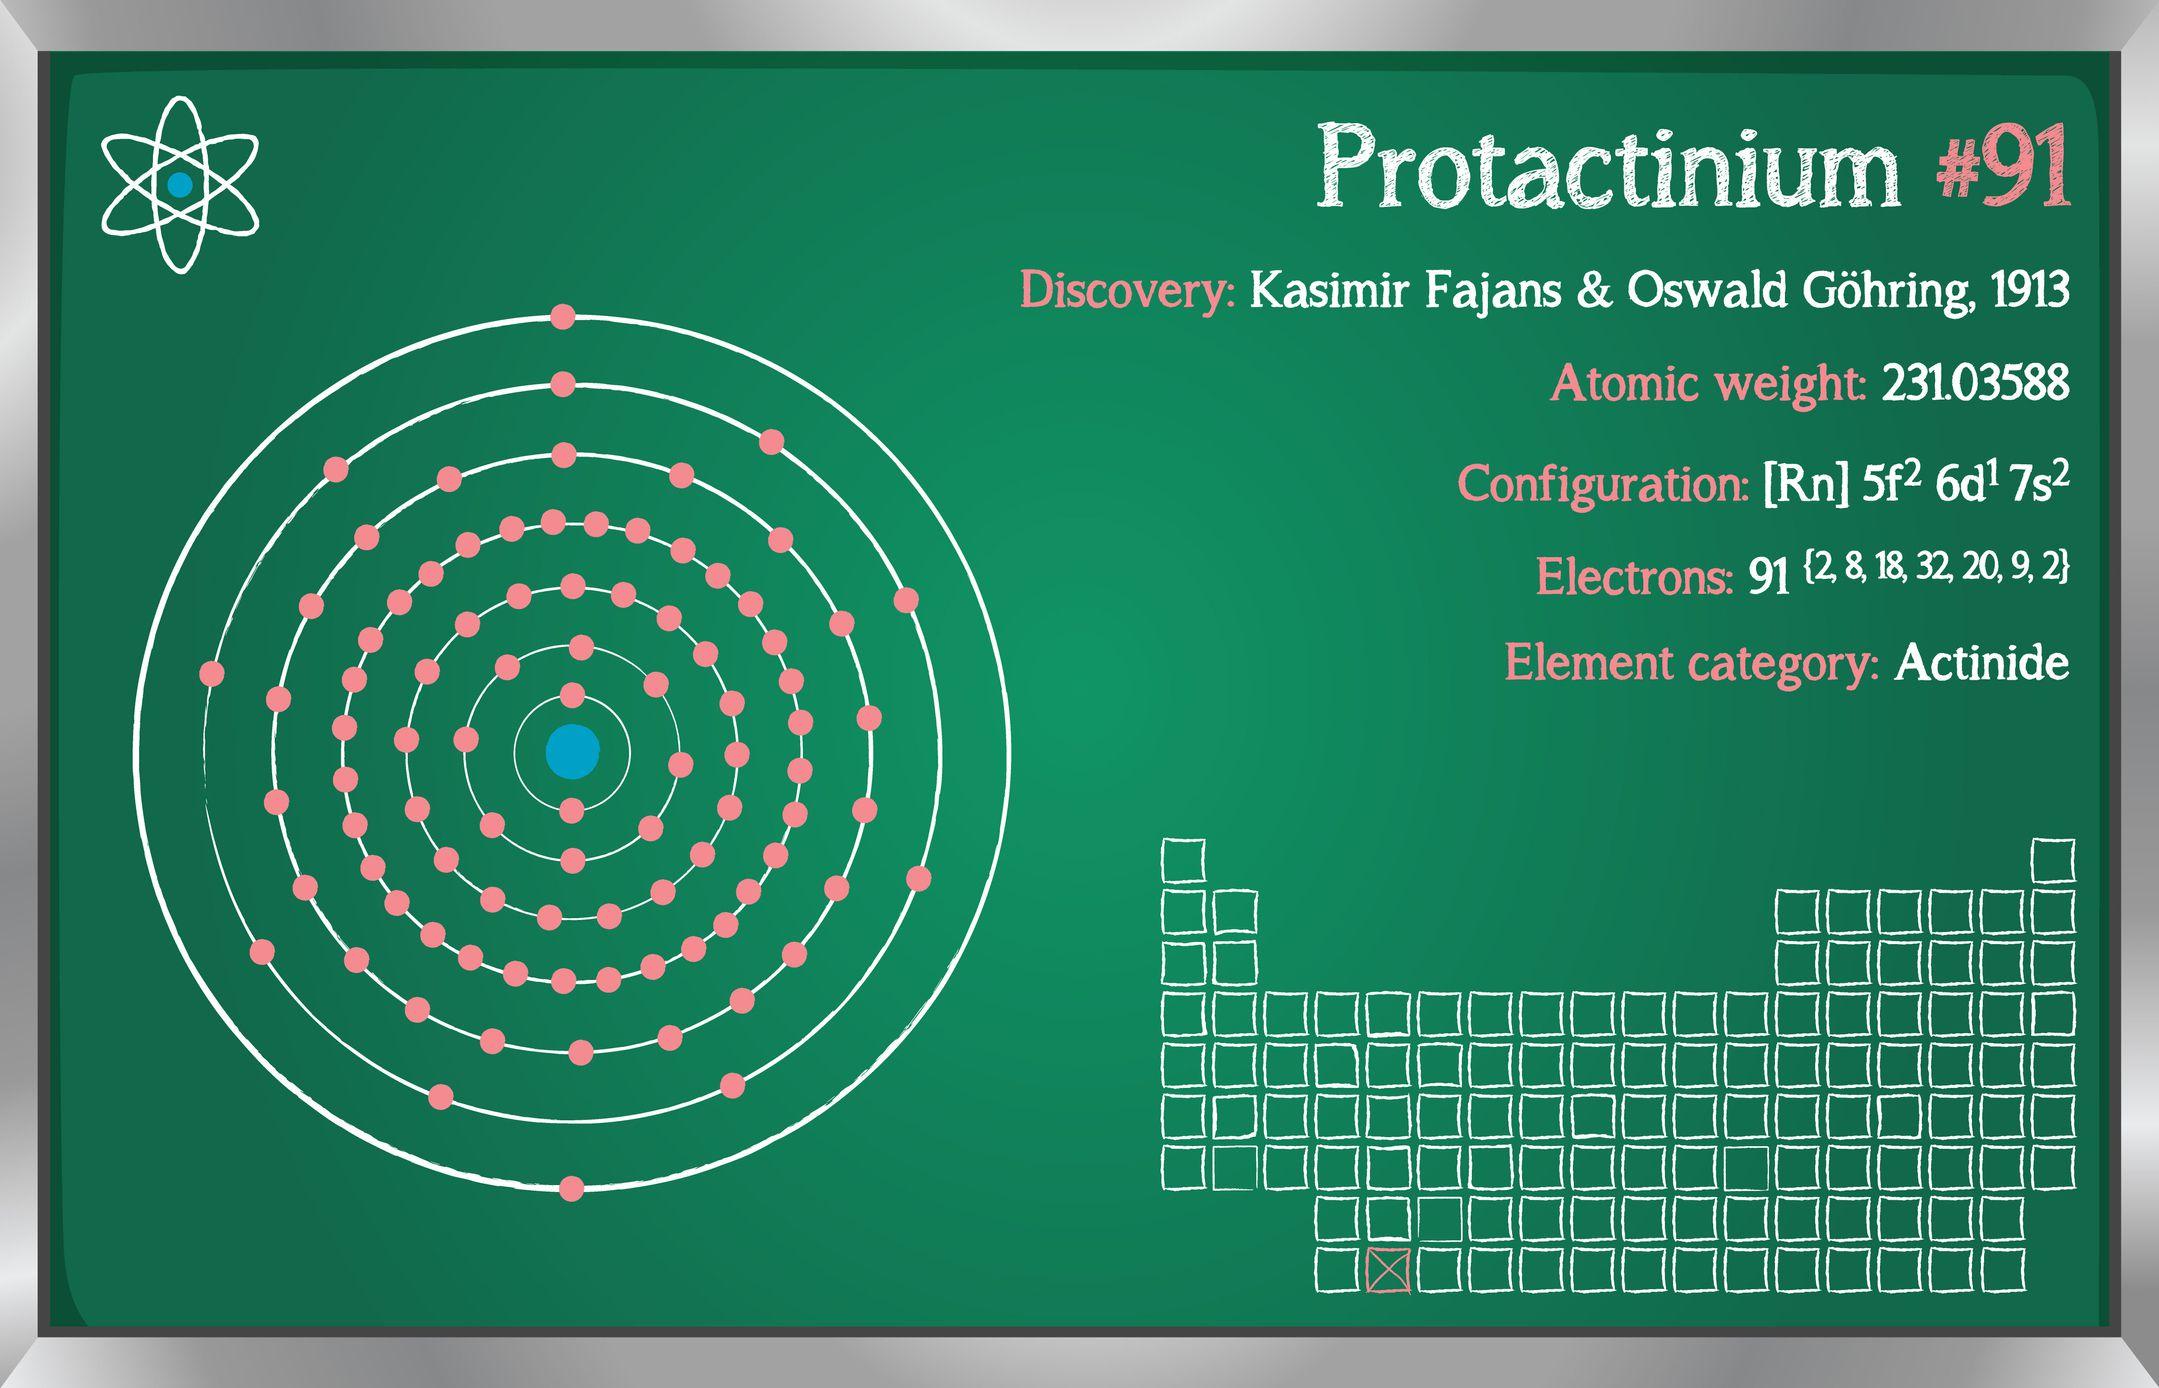 عنصر Pa أو حقائق البروتكتينيوم